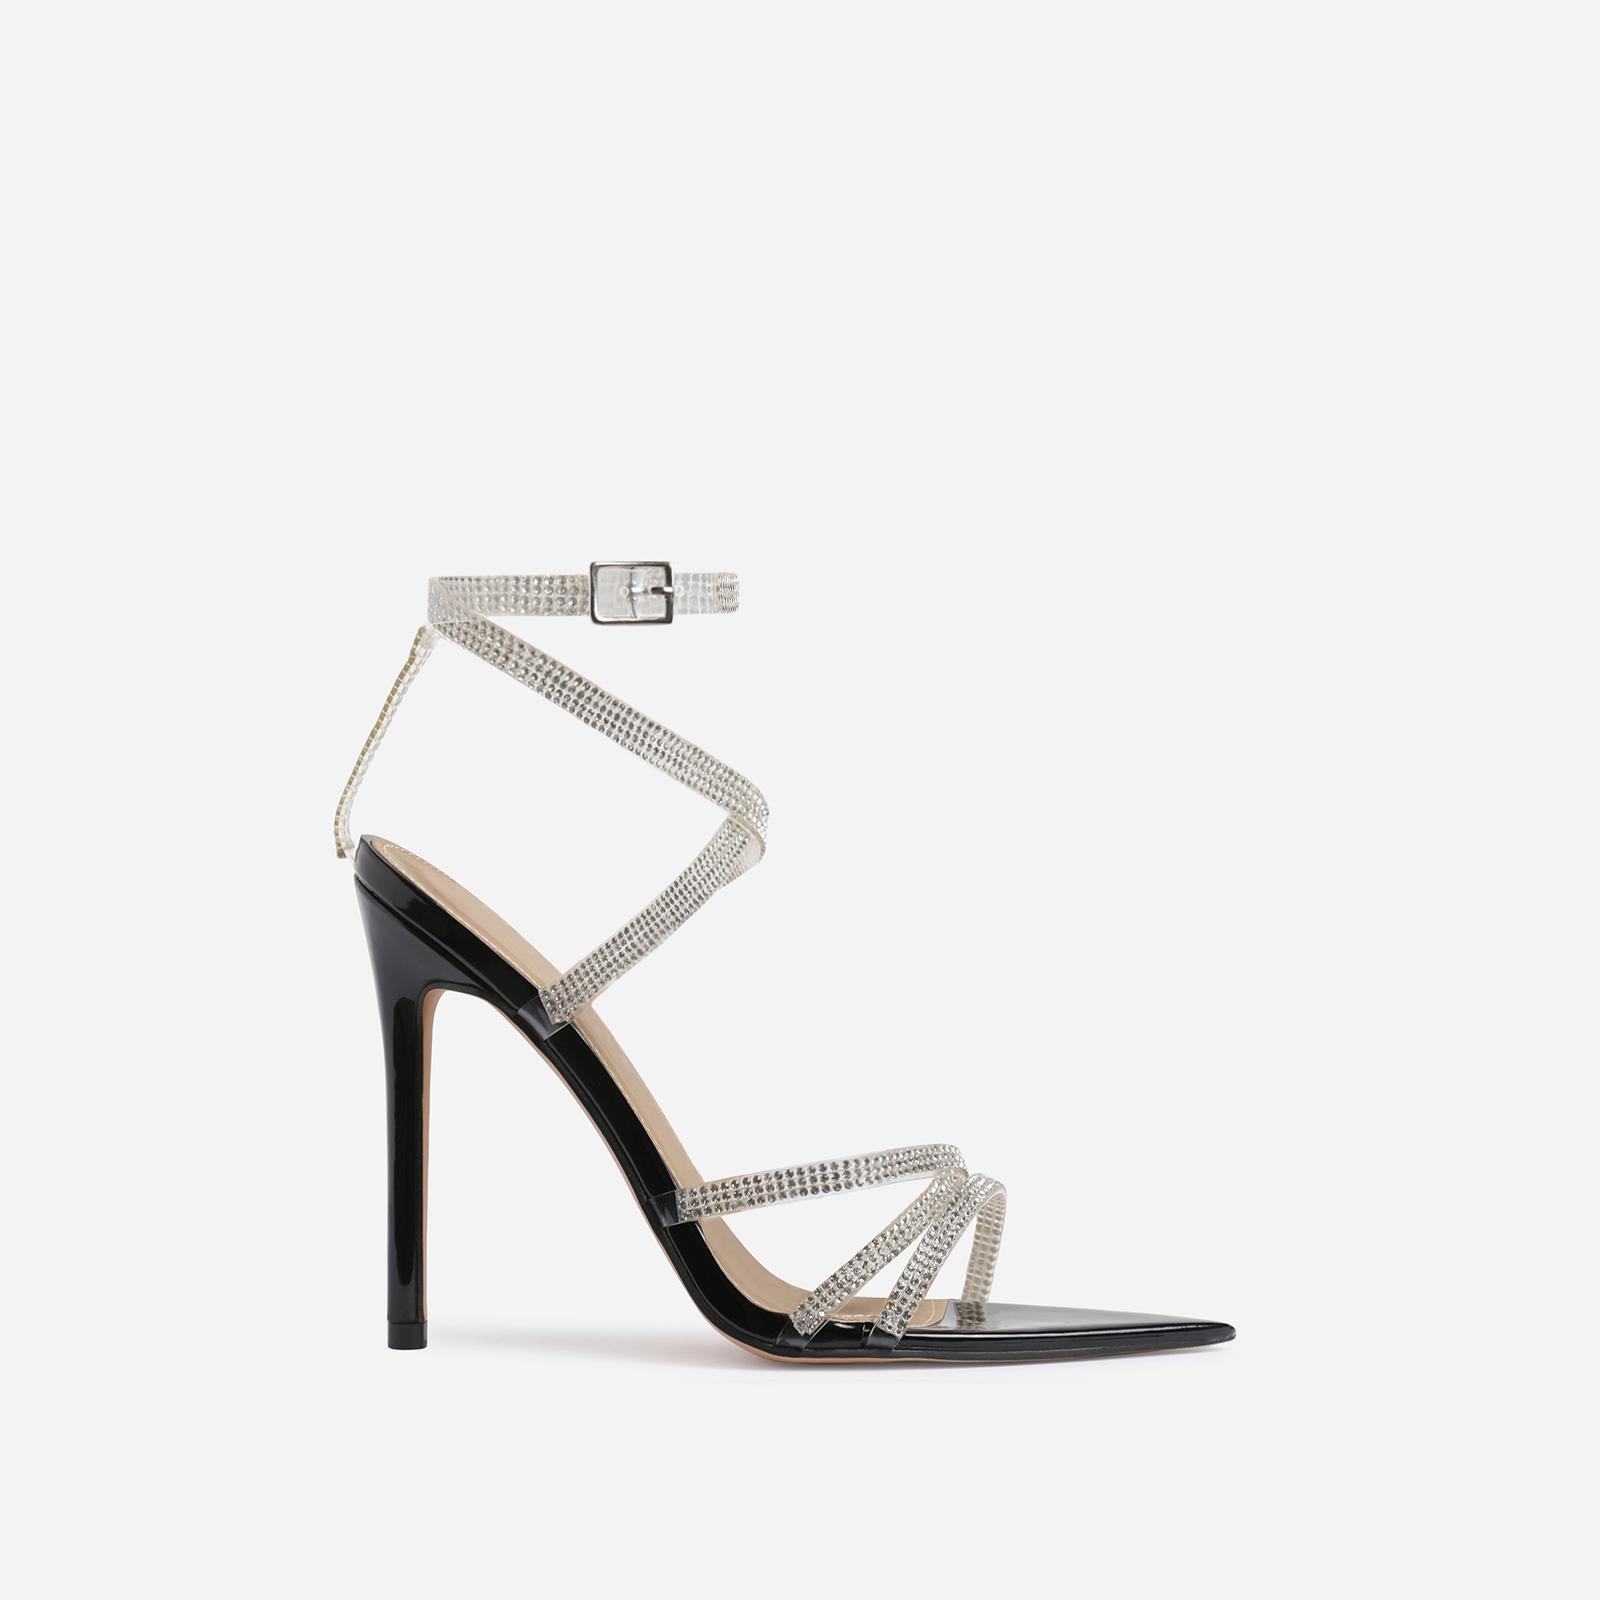 Precious Diamante Detail Pointed Toe Heel In Black Patent